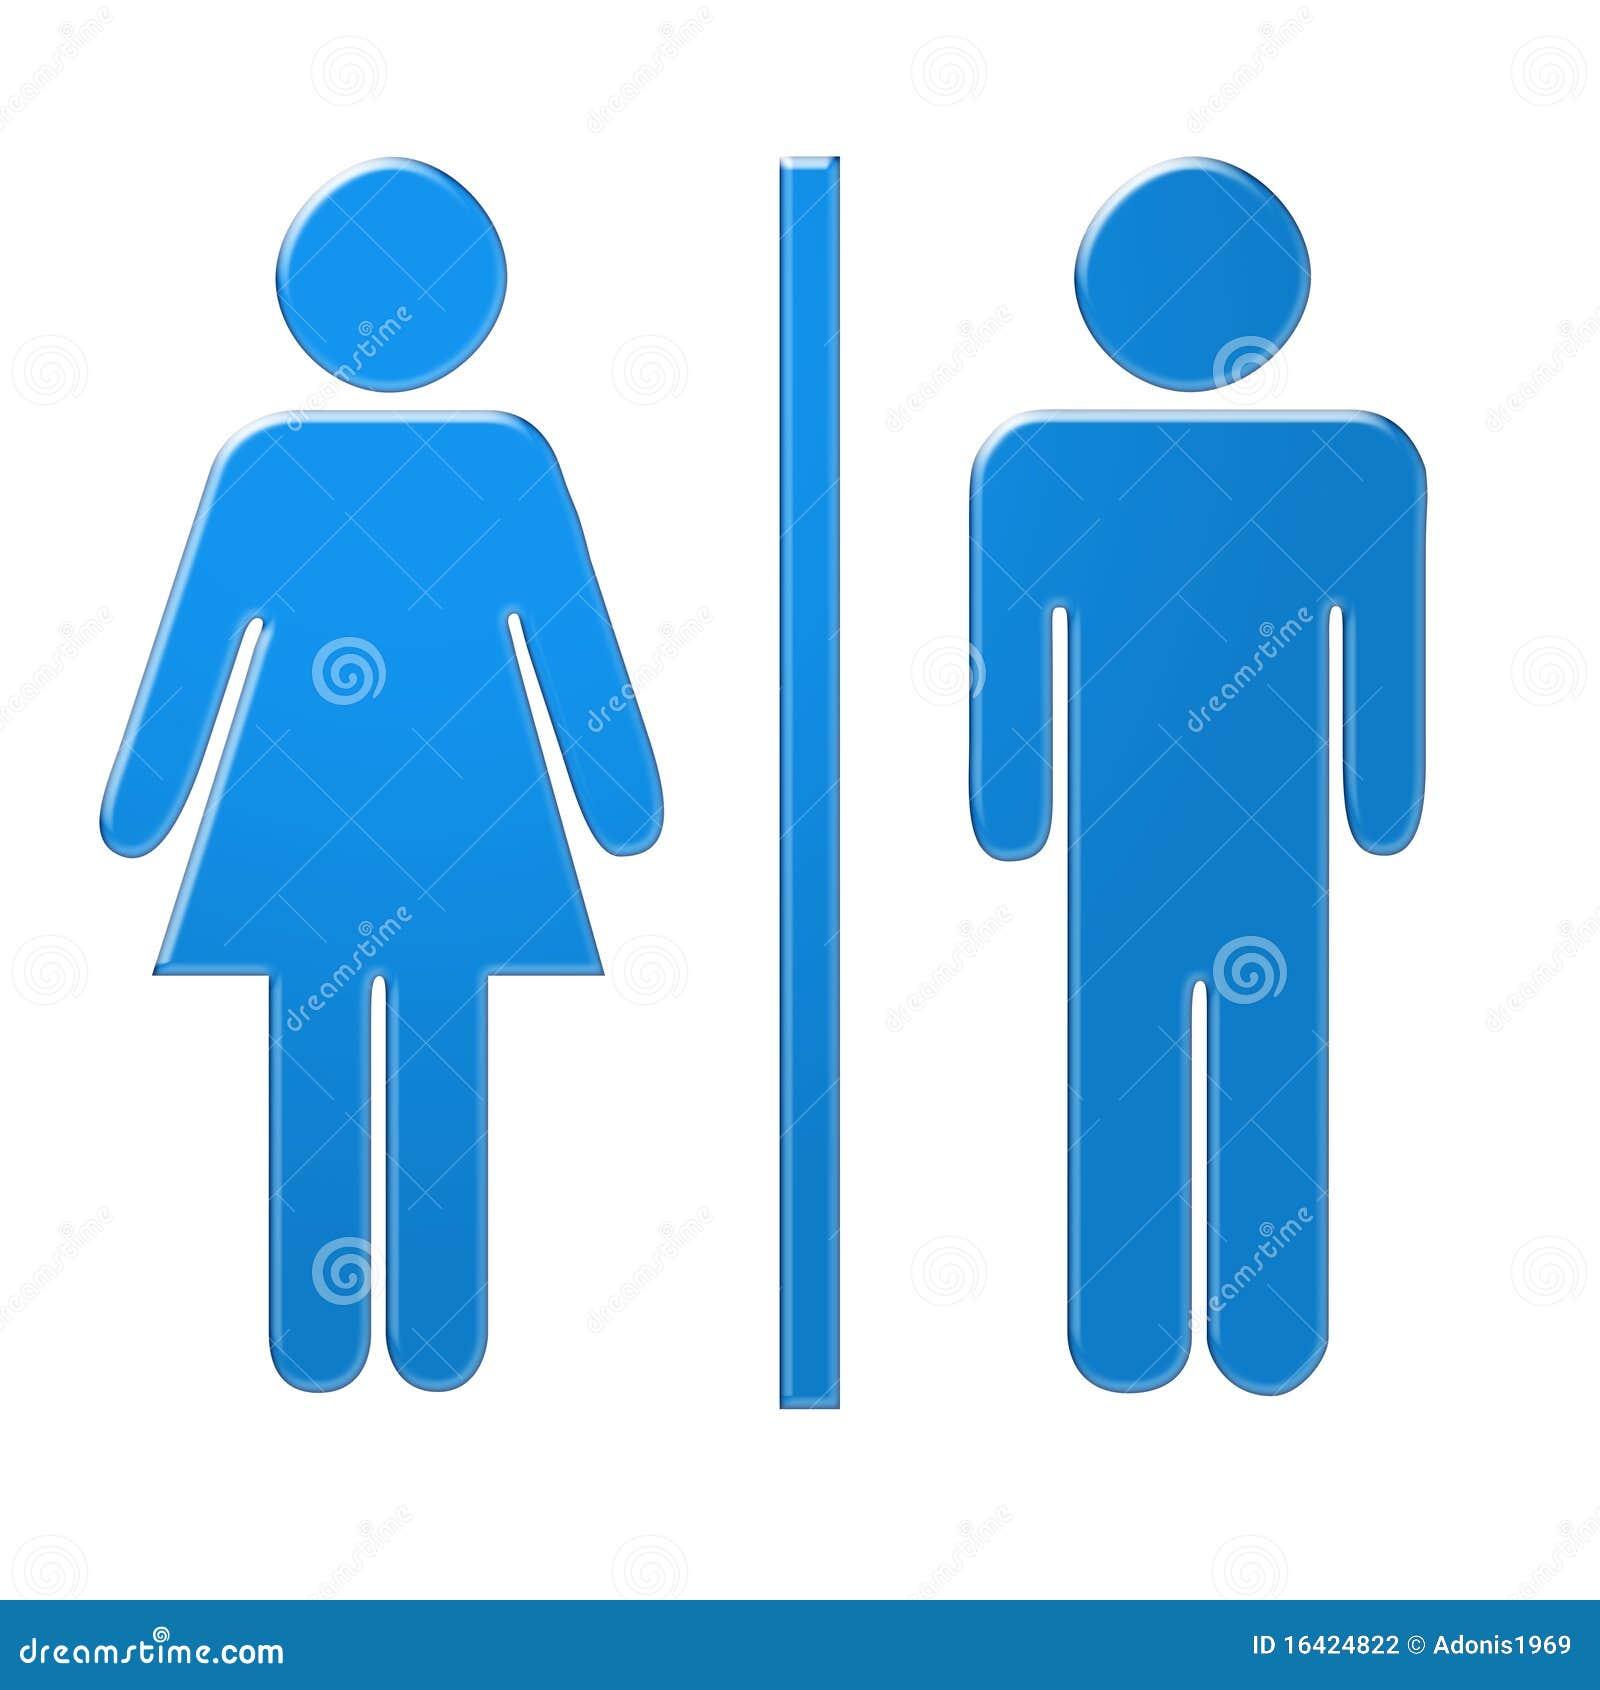 Female to male pics